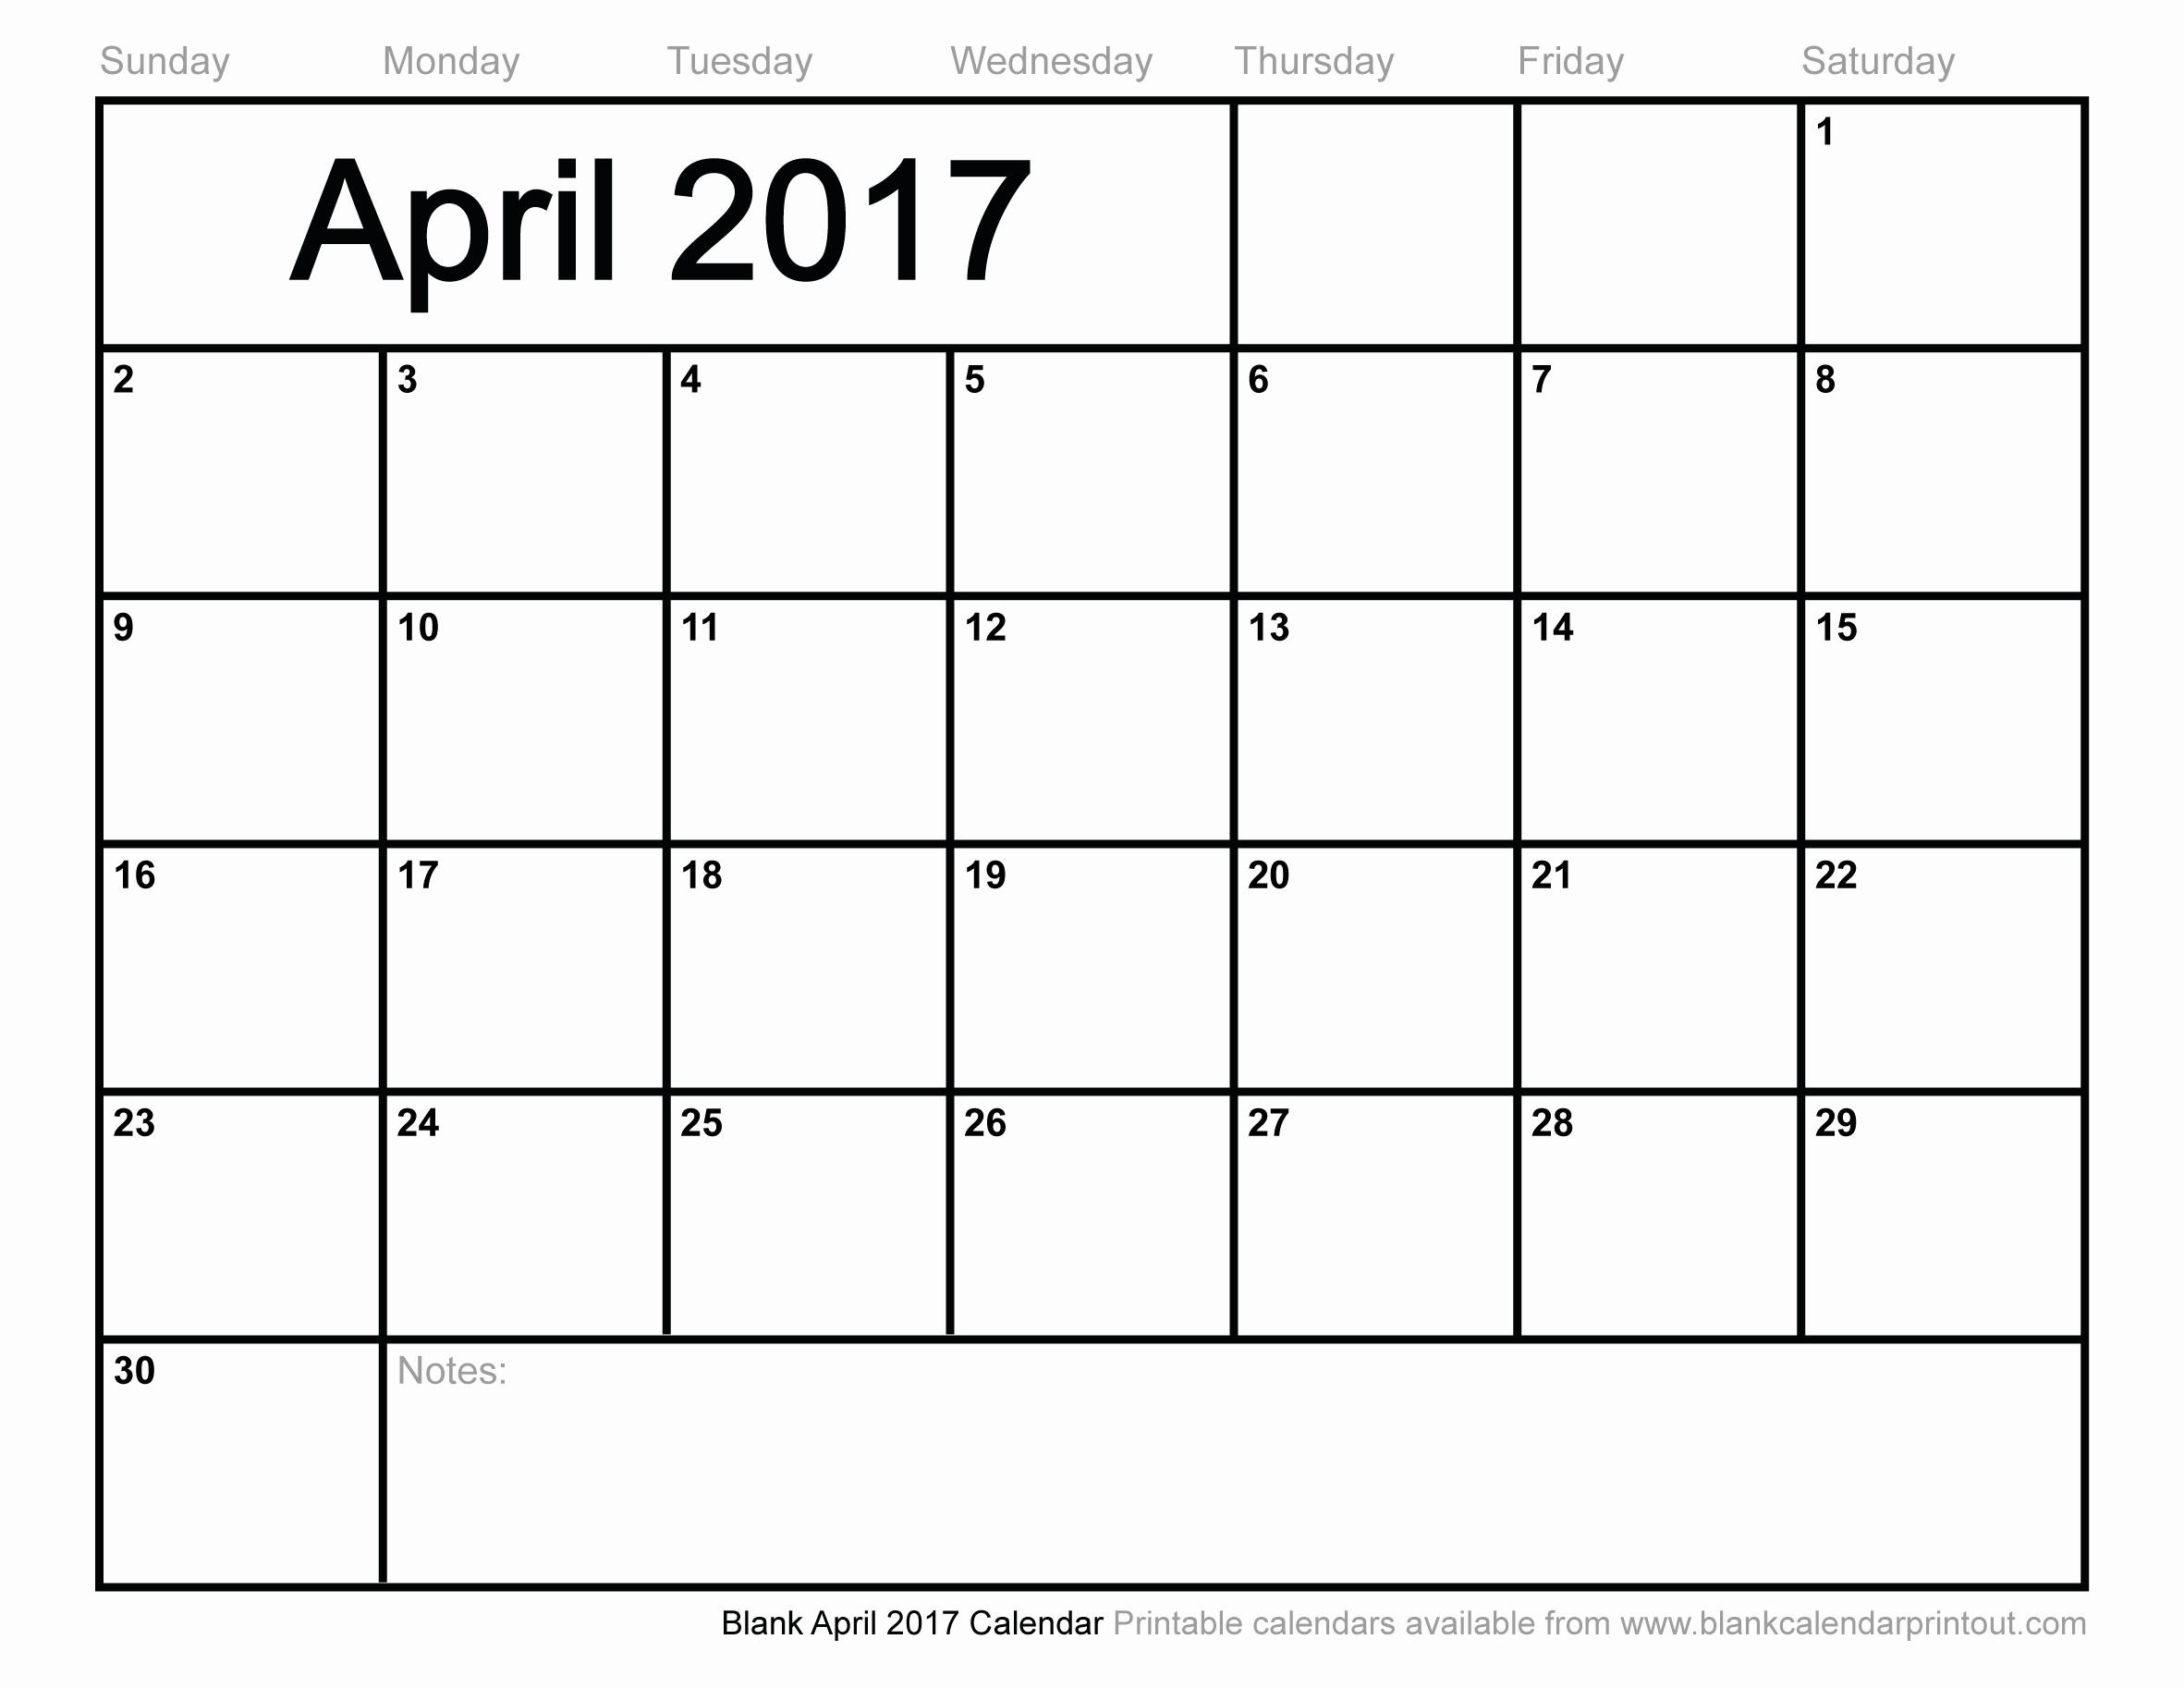 Blank May Calendar 2017 Printable Lovely Blank April 2017 Calendar